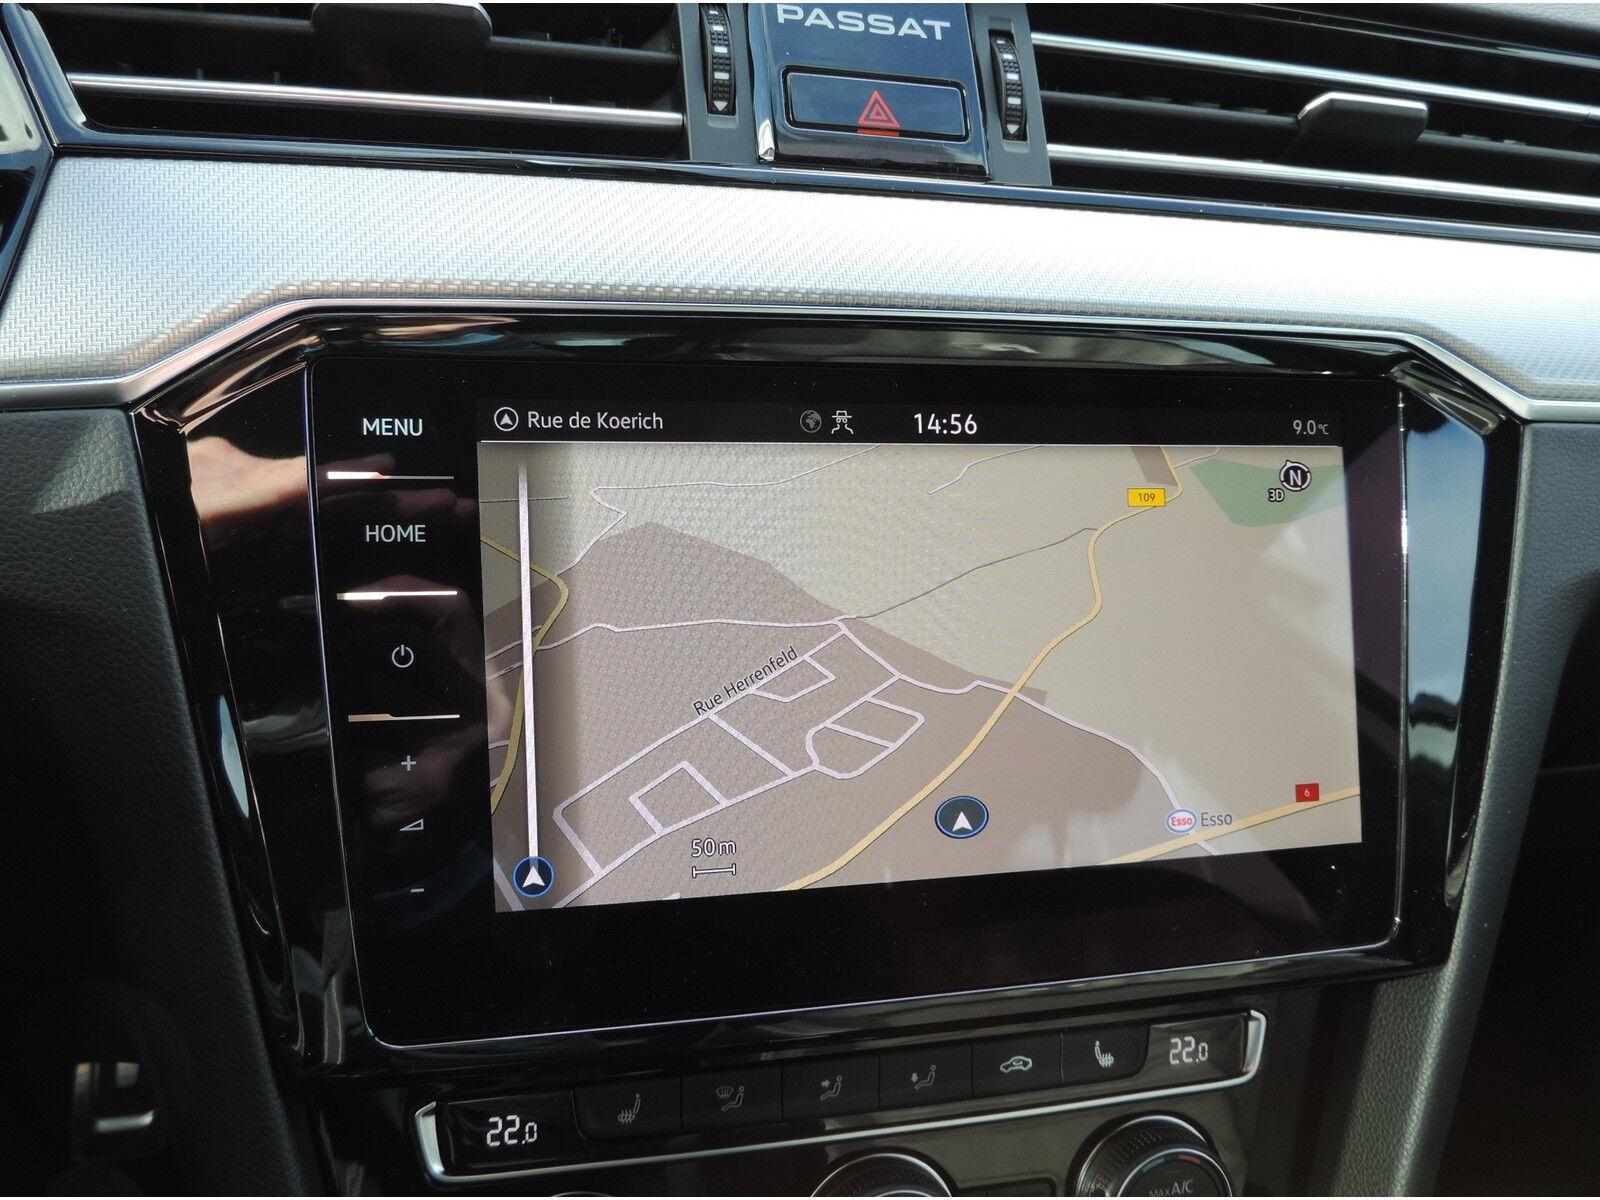 Volkswagen Passat Variant 2.0 TSI R-Line DSG CUIR GPS ACC LANE NEUVE 9/15